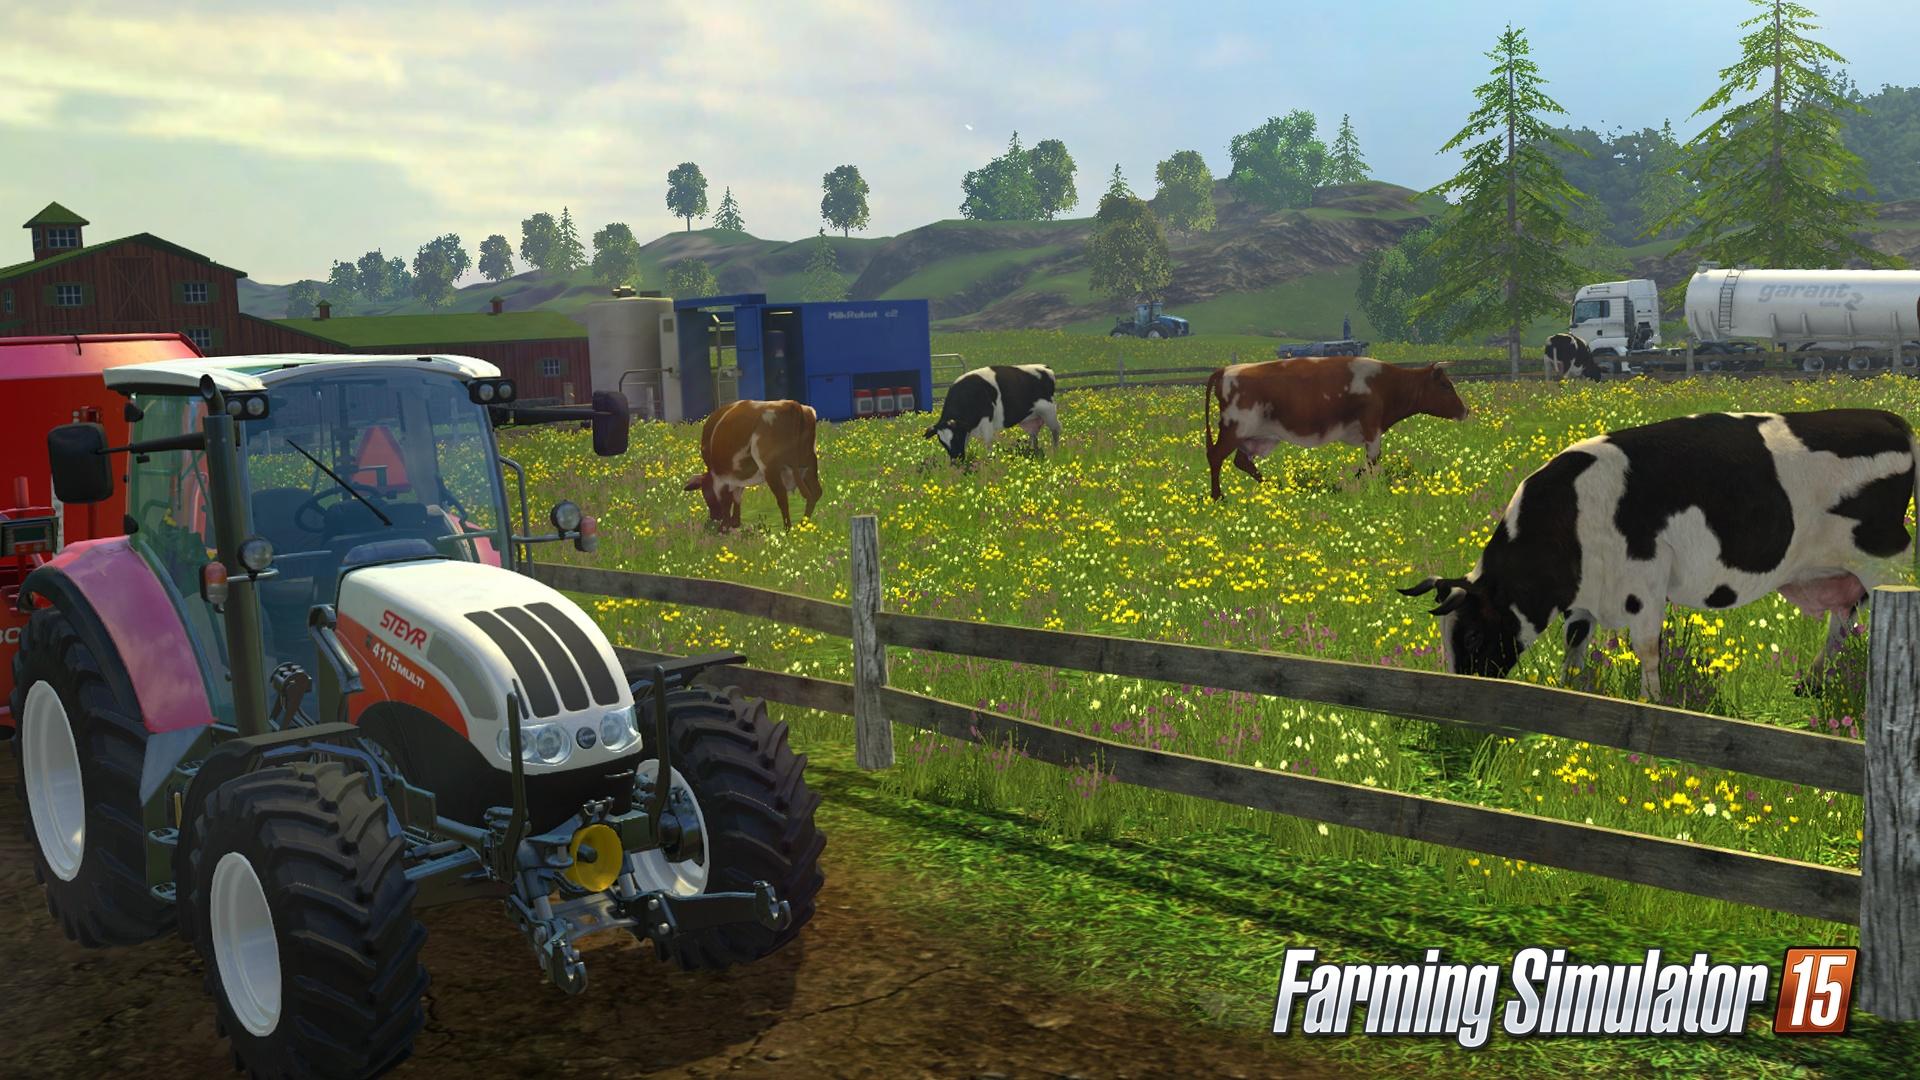 Farming Simulator 15 image #5